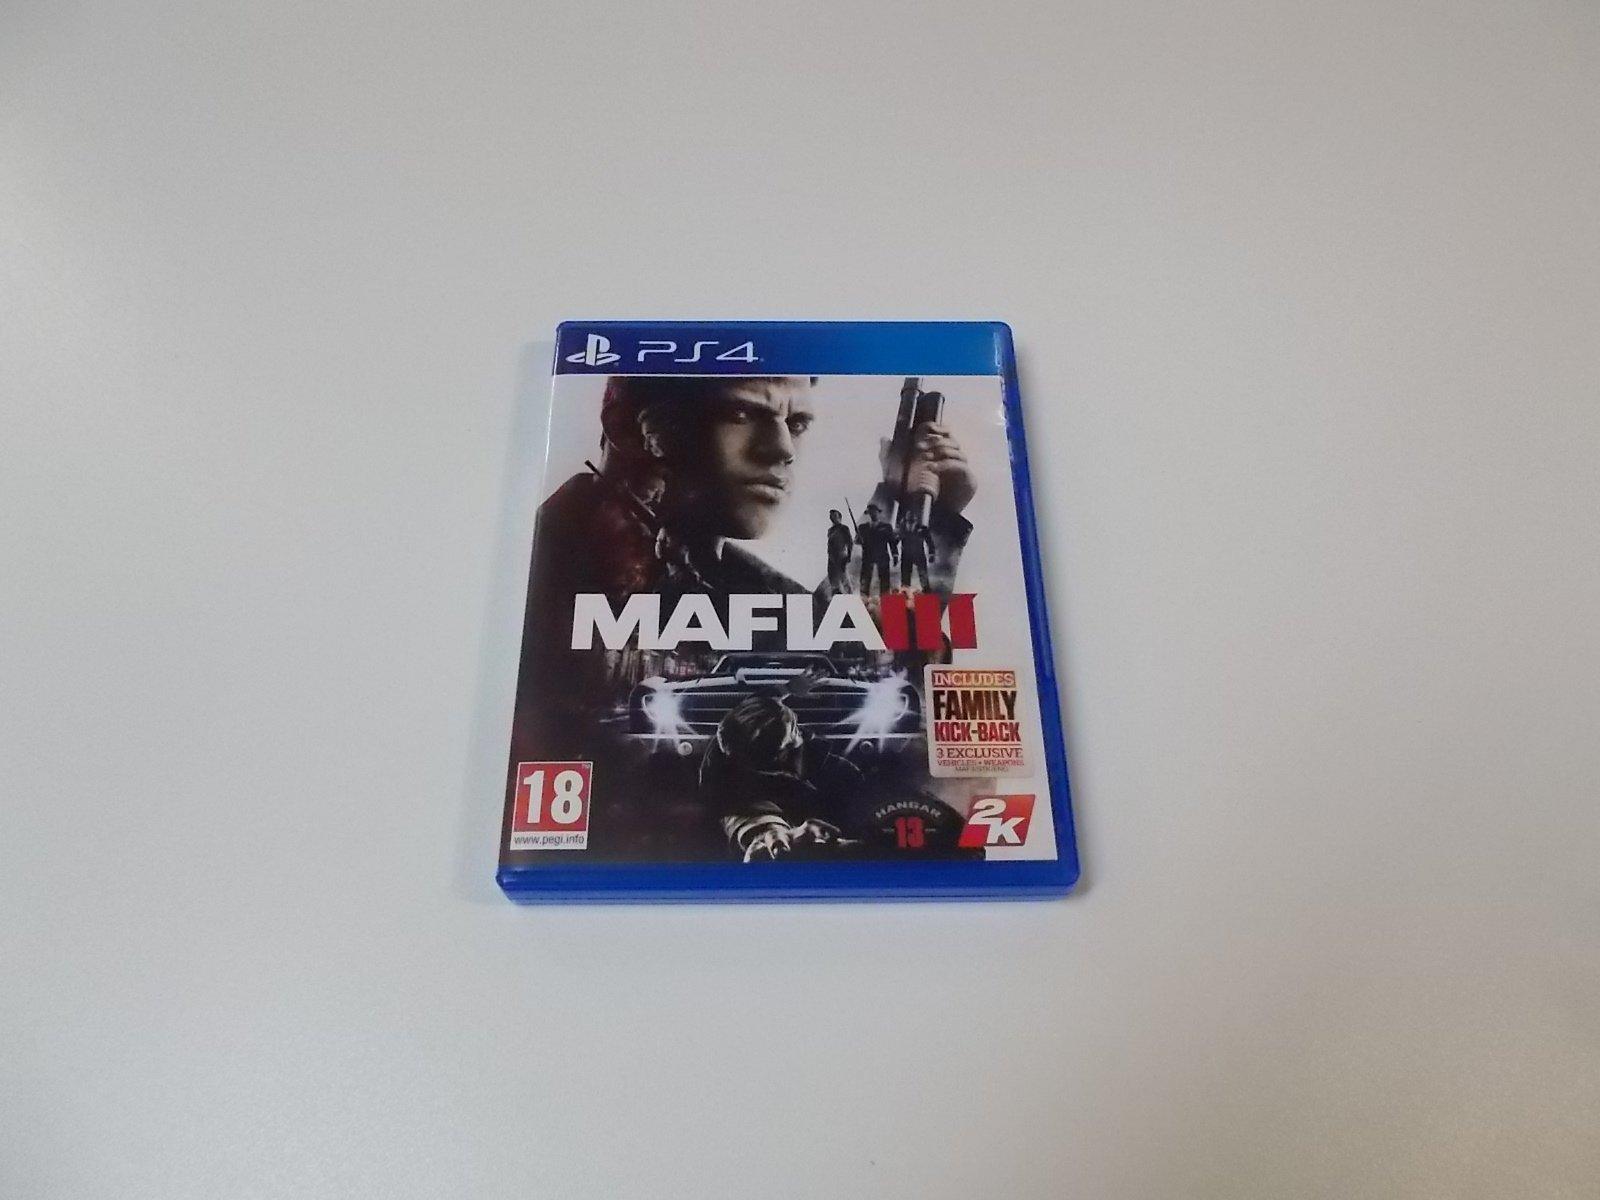 Mafia 3 III - GRA Ps4 - Opole 0495